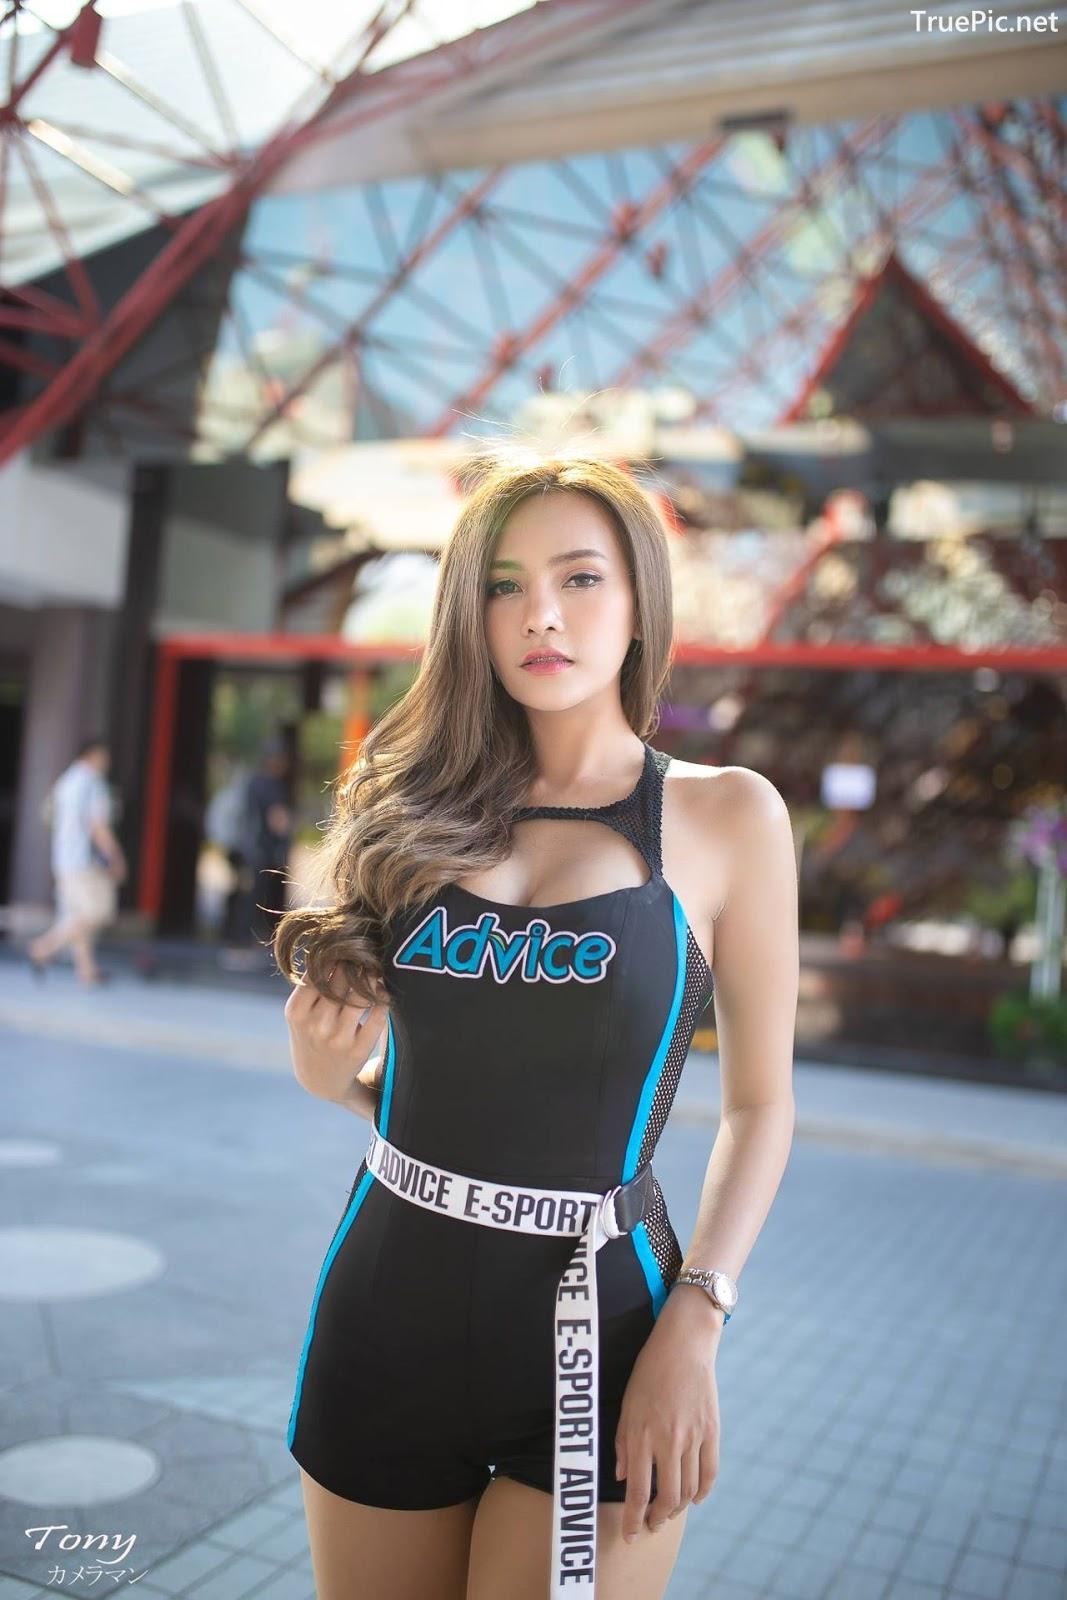 Image-Thailand-Hot-Model-Thai-PG-At-Commart-2018-TruePic.net- Picture-33